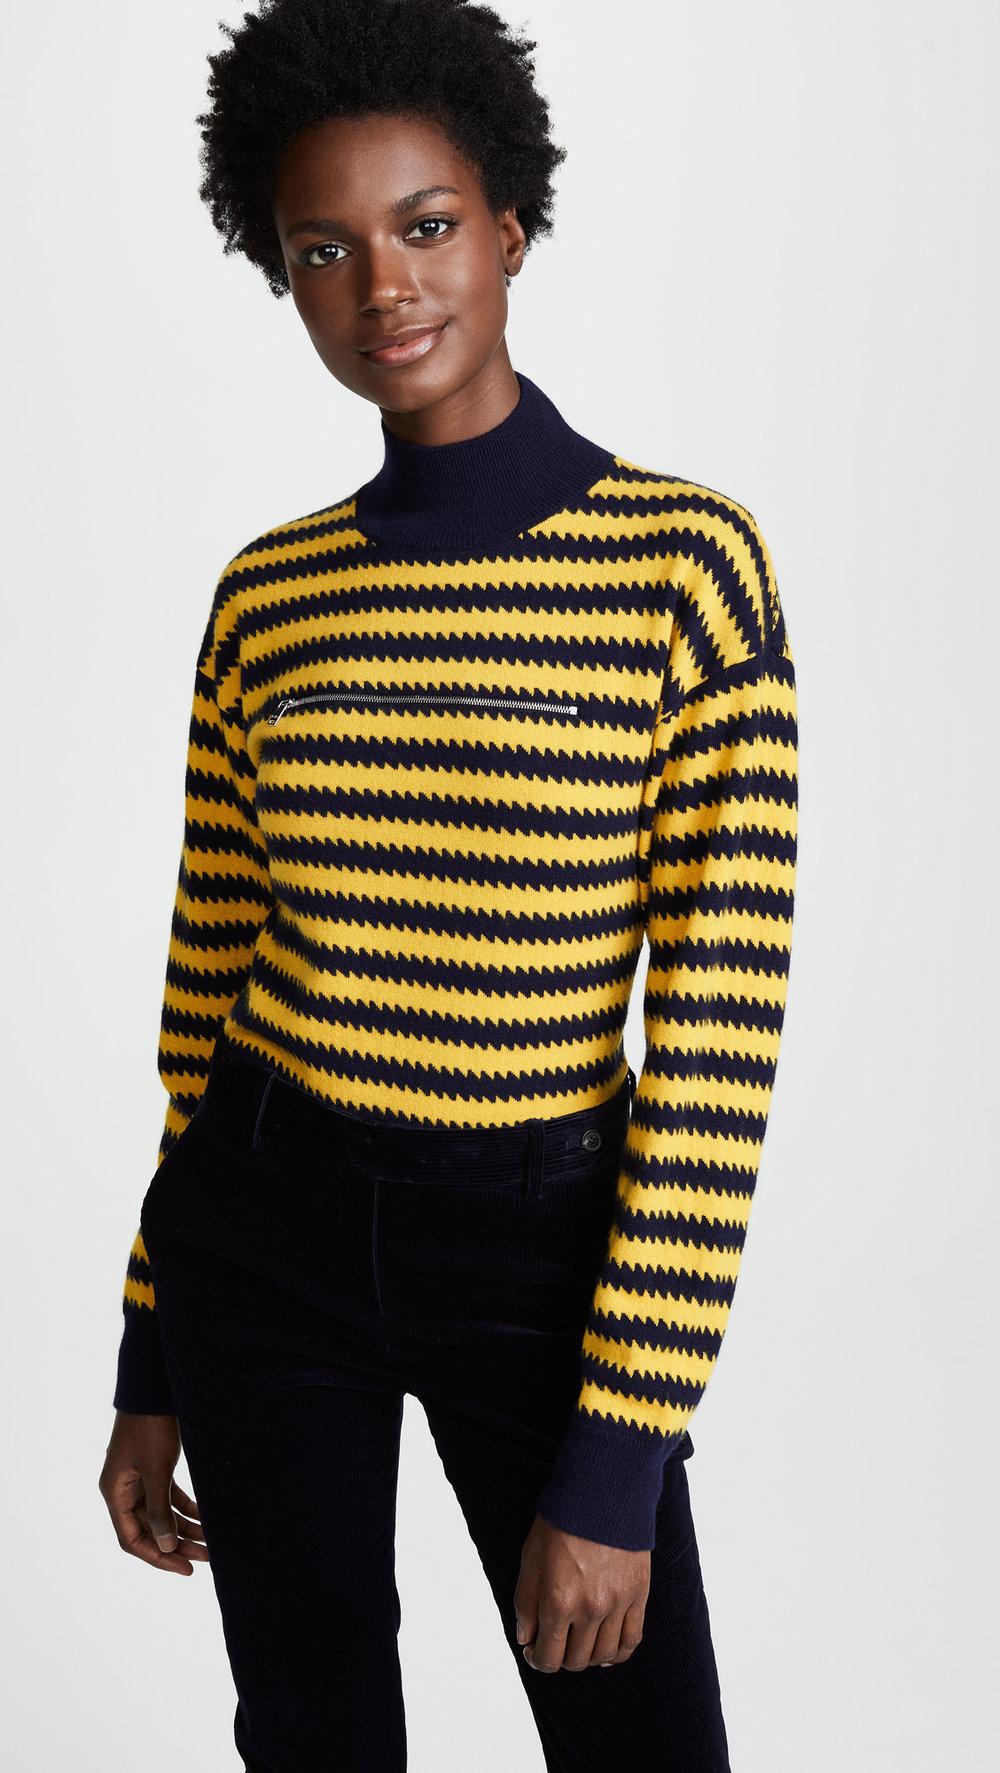 Sonia Rykiel Knitted jumper Olympia.jpg